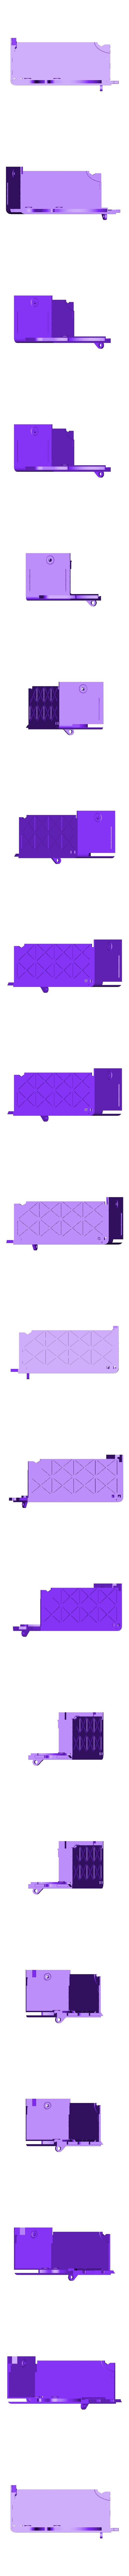 Cont liv 1 n4.stl Download STL file Multiple container ( closed 180x370mm) construction Contenitore multipla trasportabile Multibox • 3D printable design, mikifly10